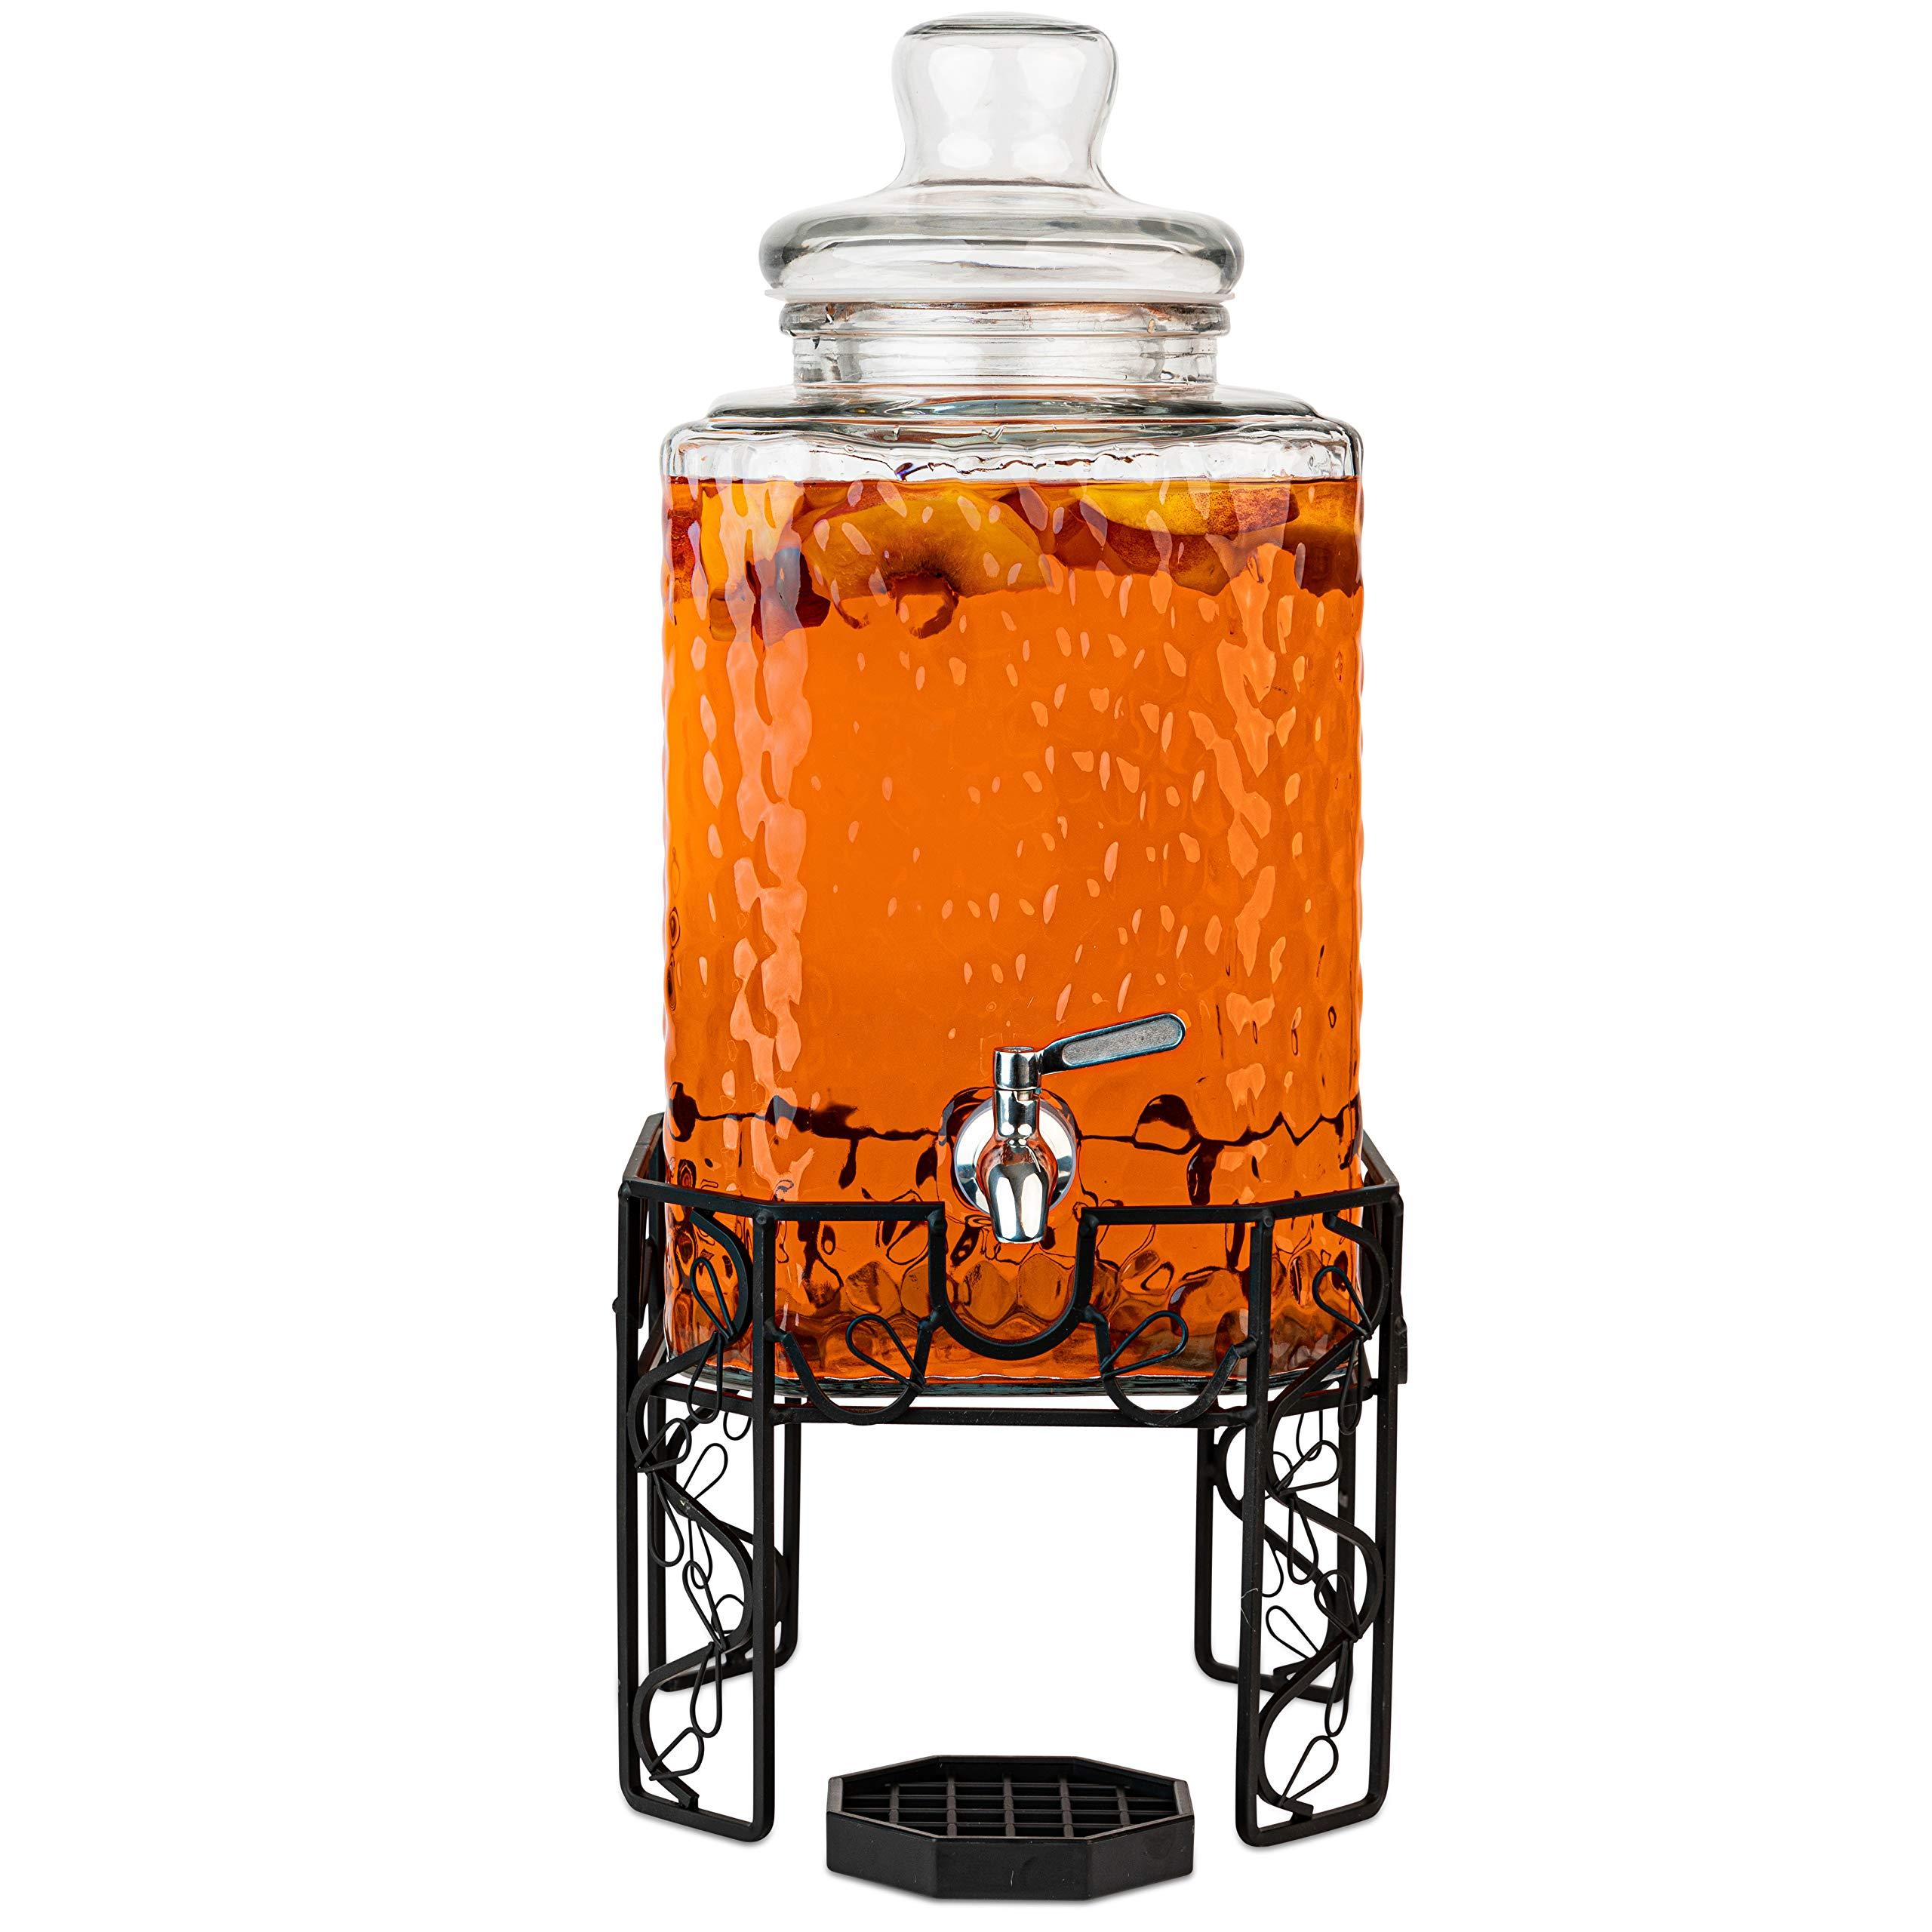 Beverage Dispenser Stainless Decorative Kombucha